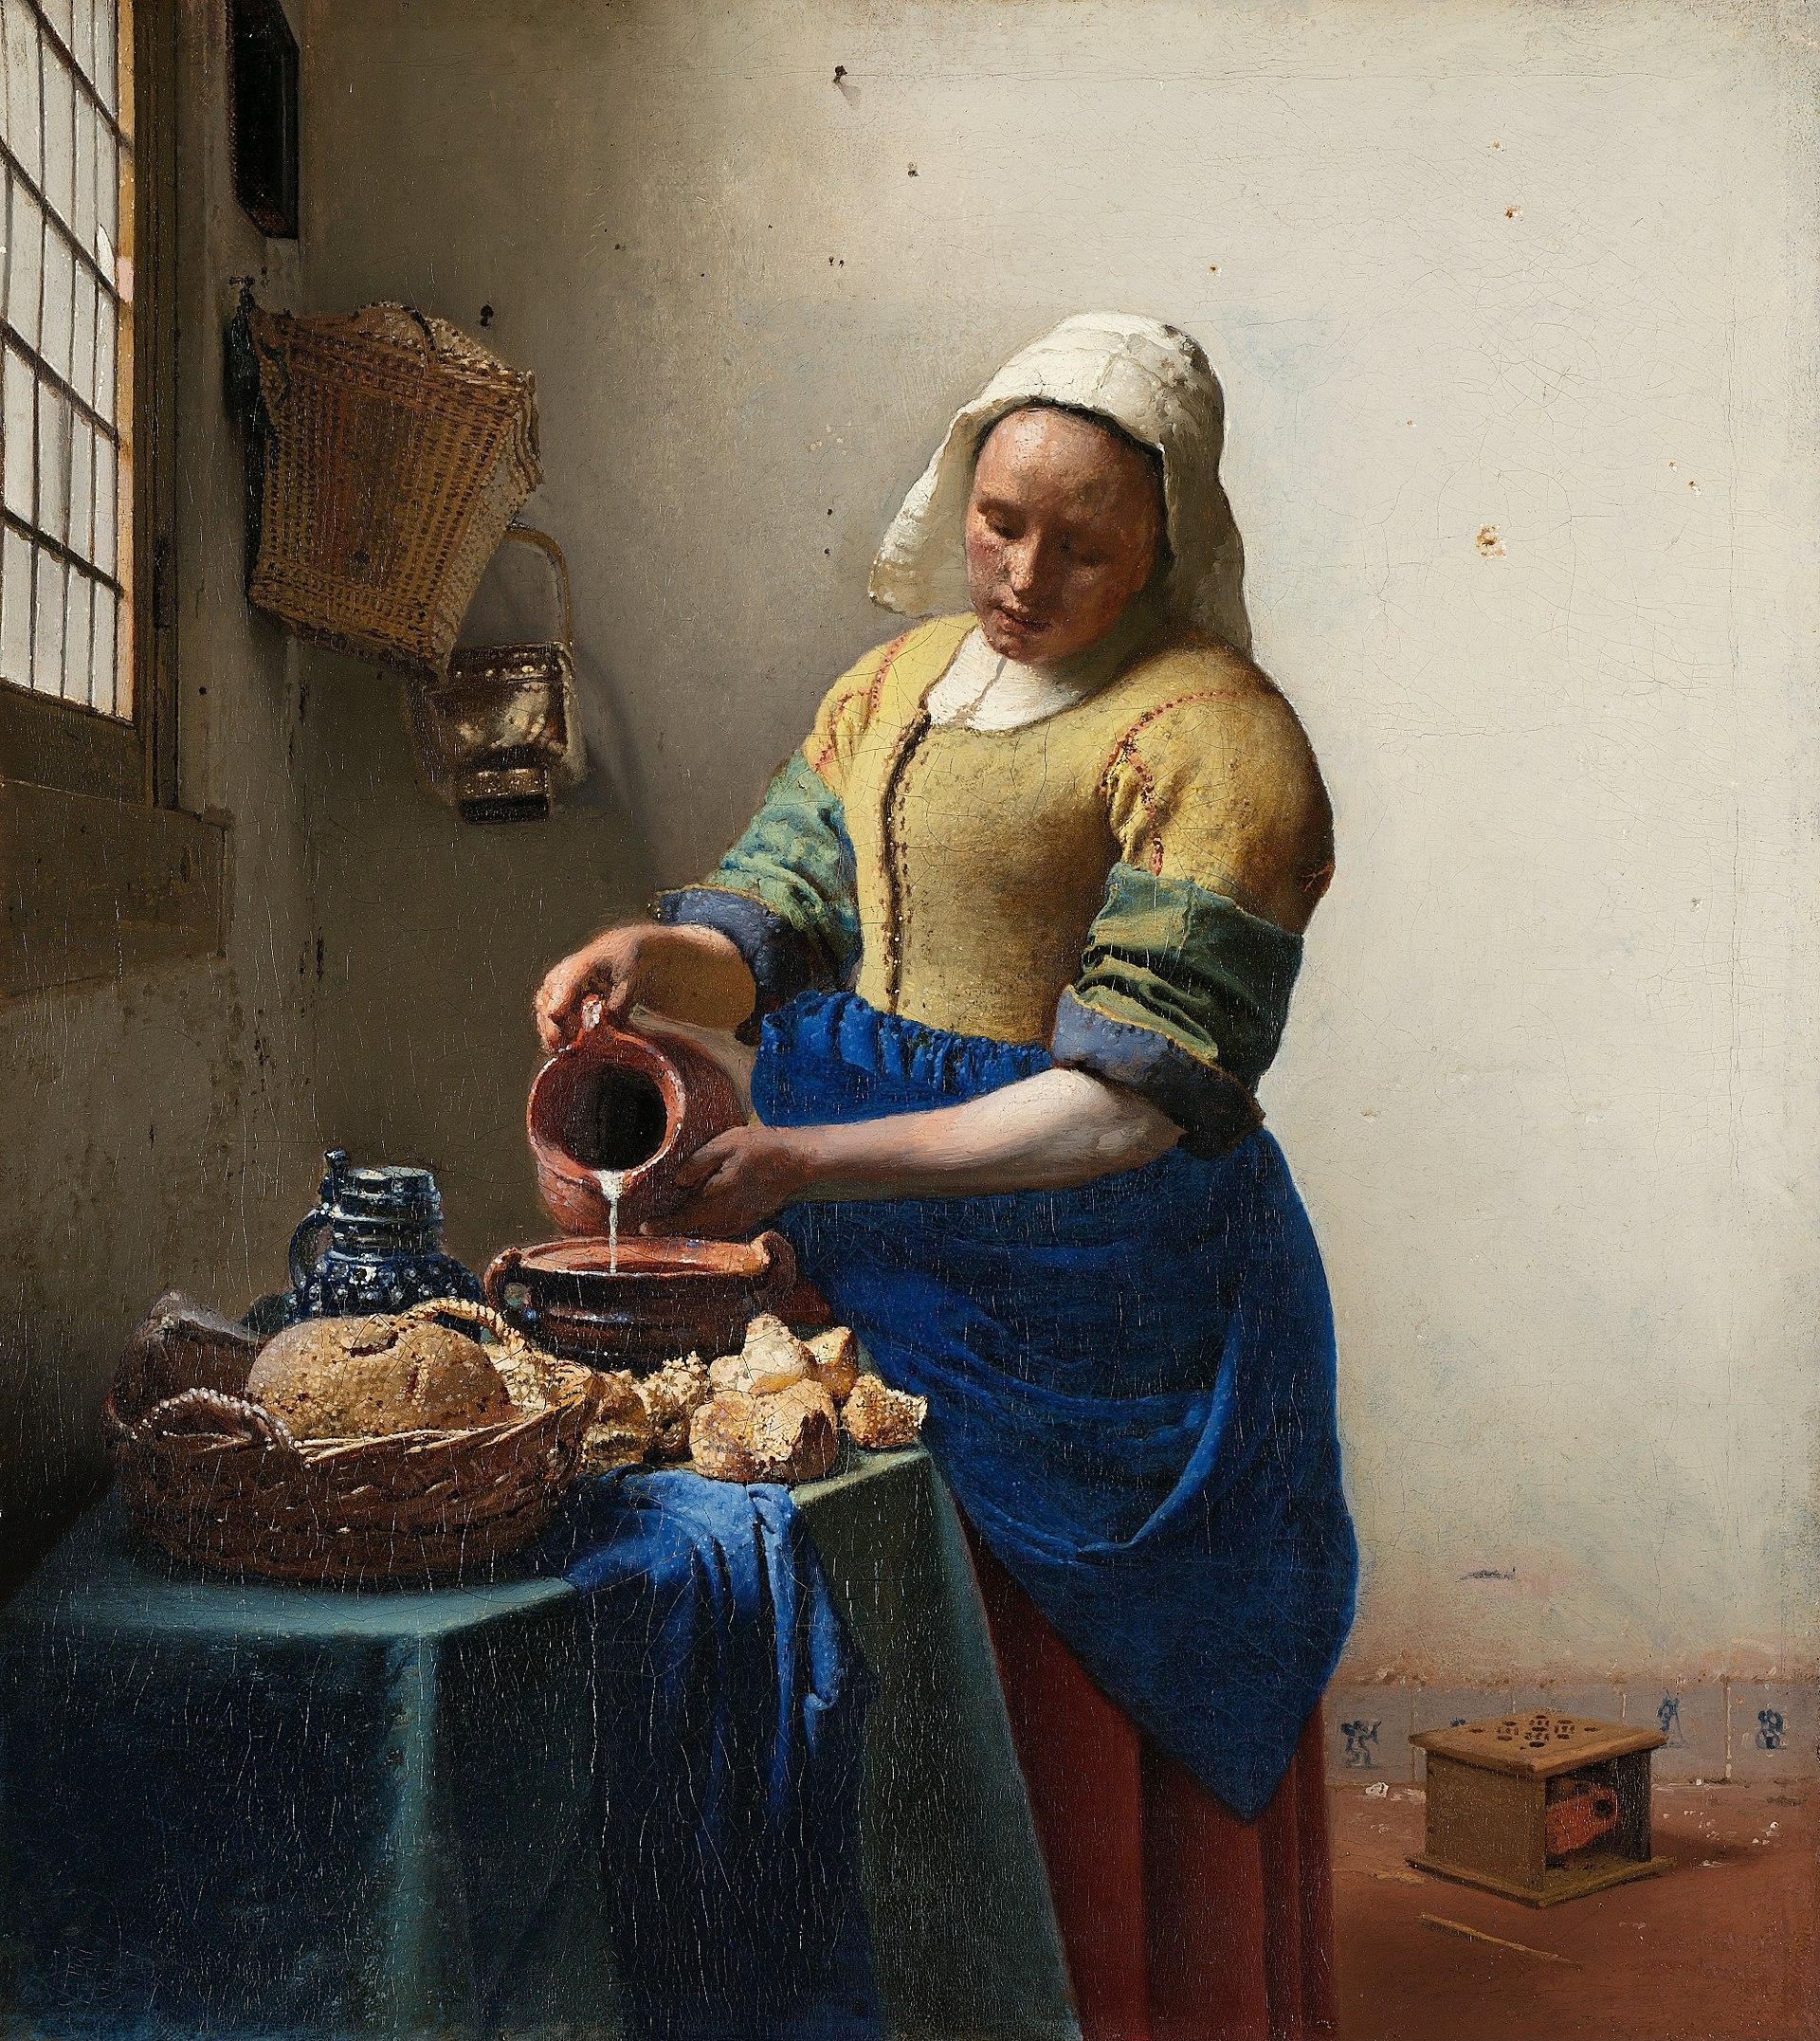 29. La Lattaia - Jan Vermeer (c. 1658-60) – Rijksmuseum, Amsterdam